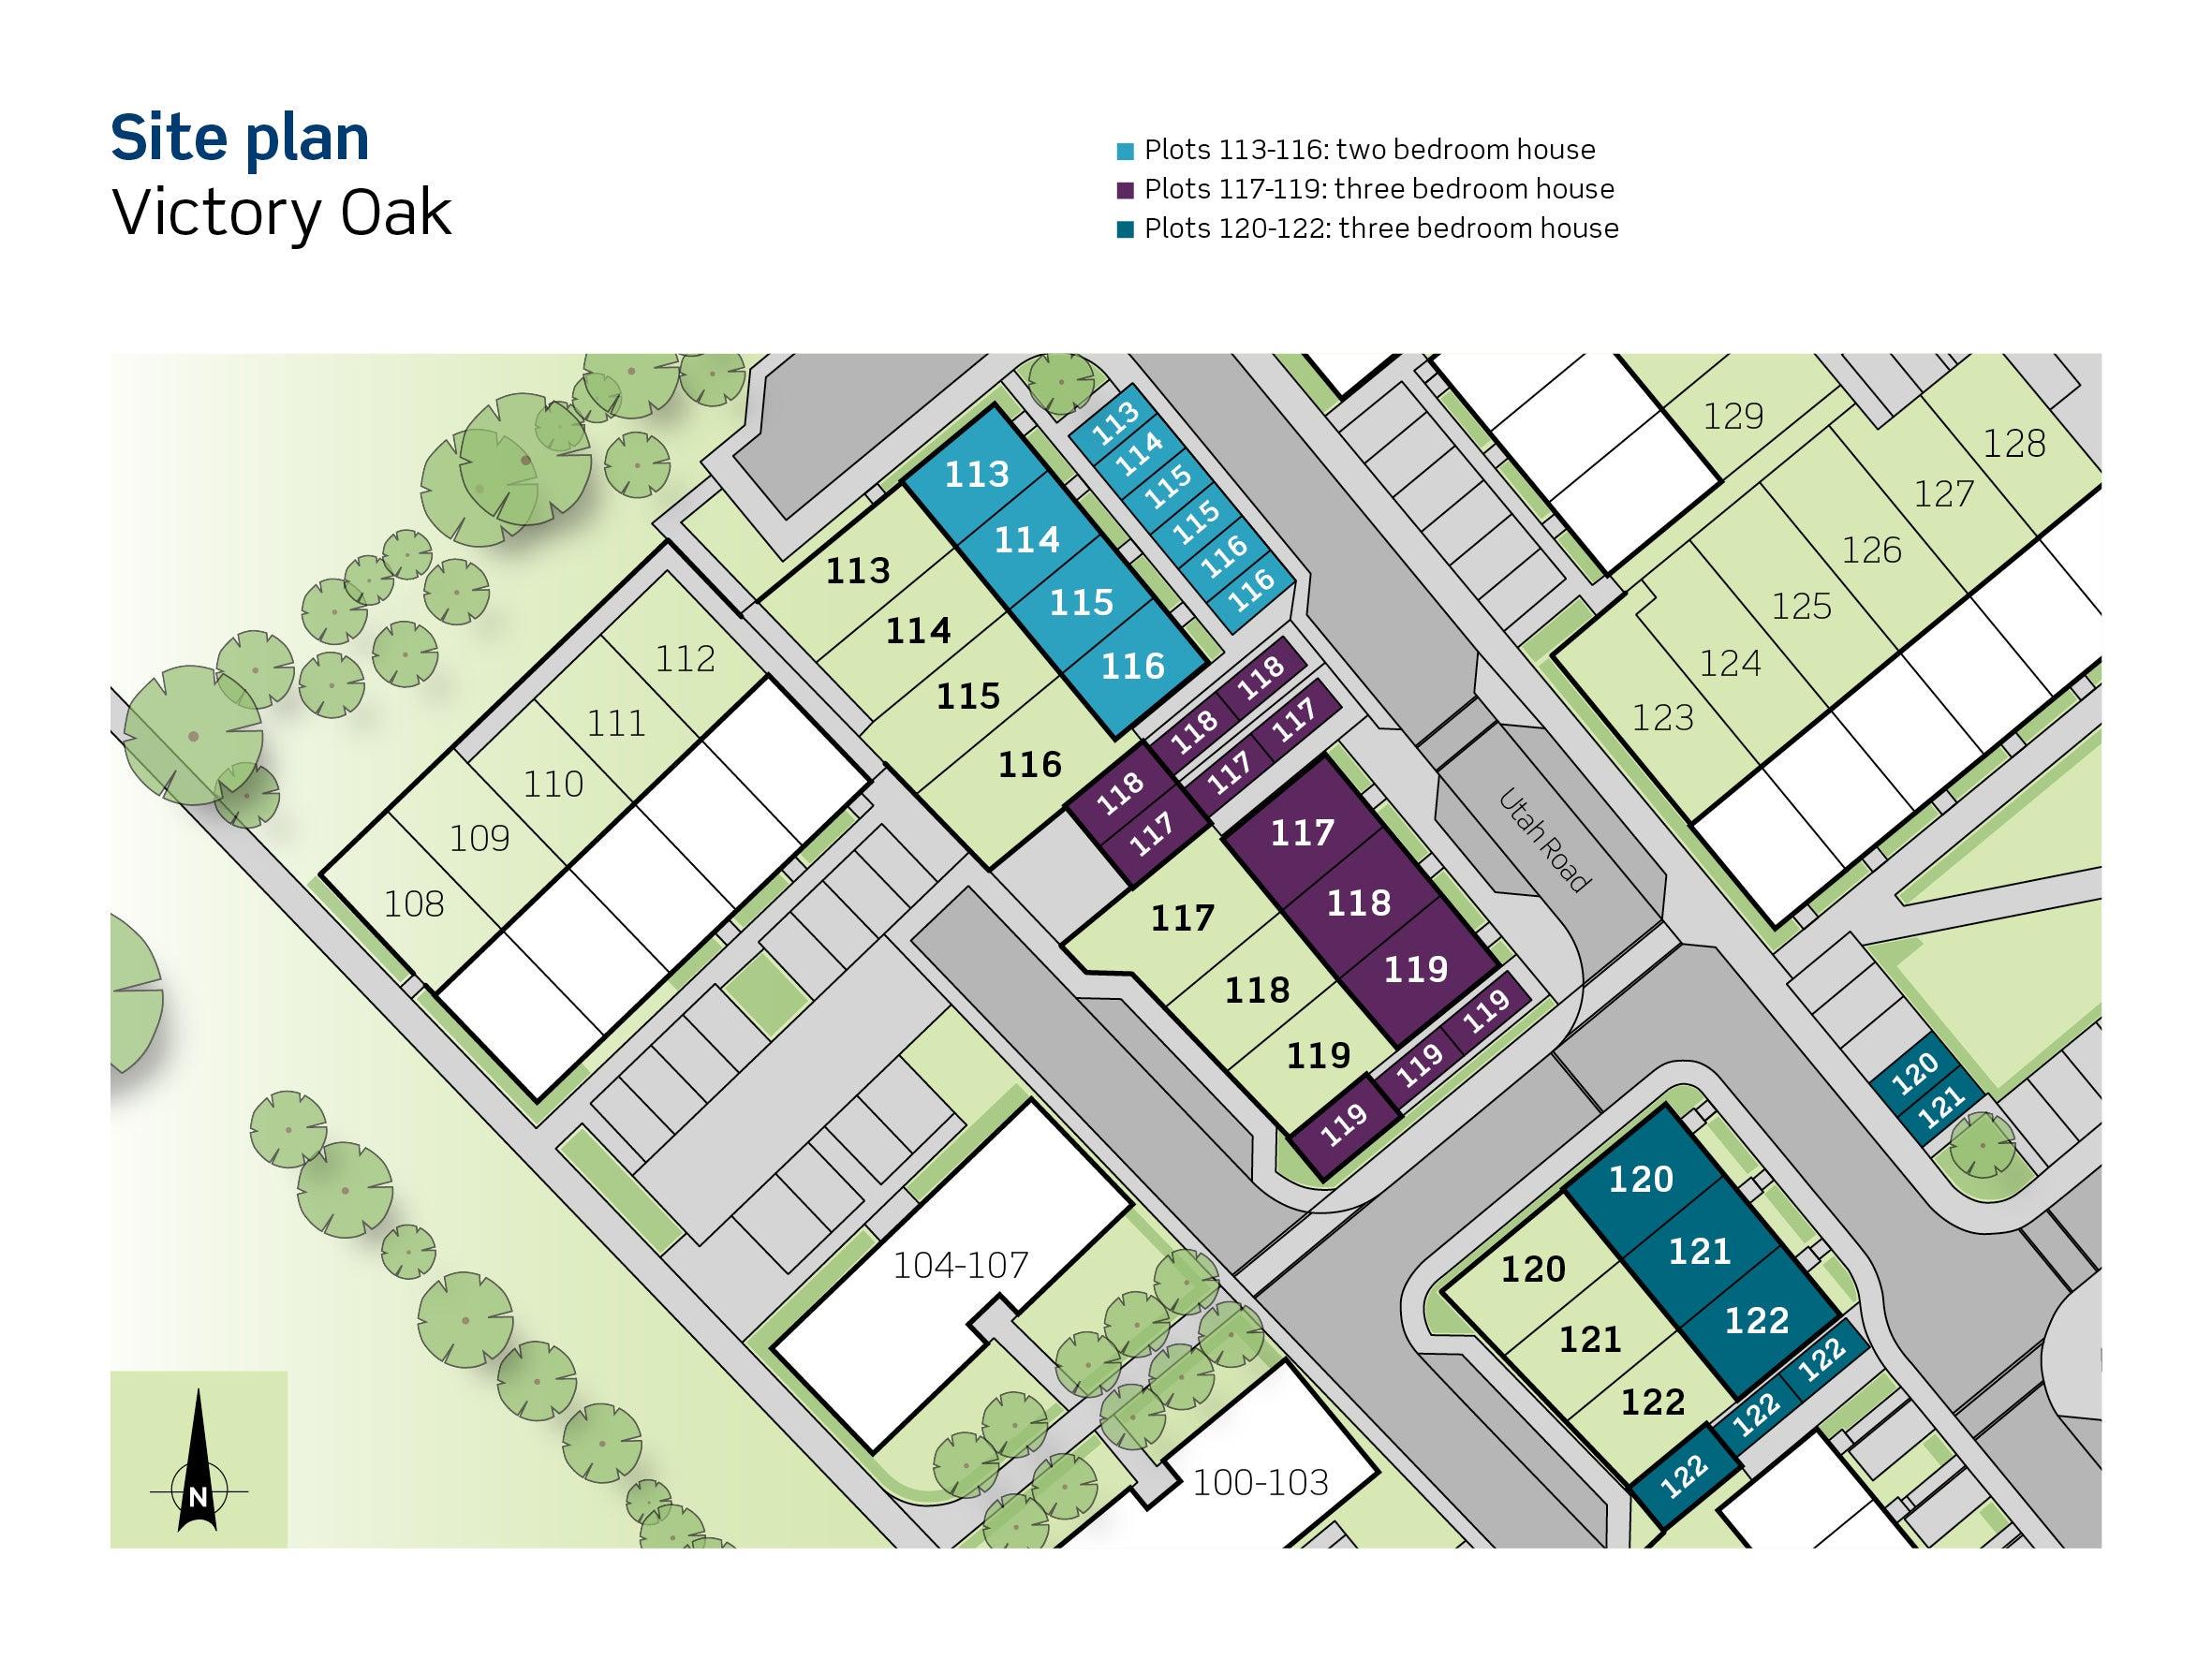 Drawing of Victory Oak site plan